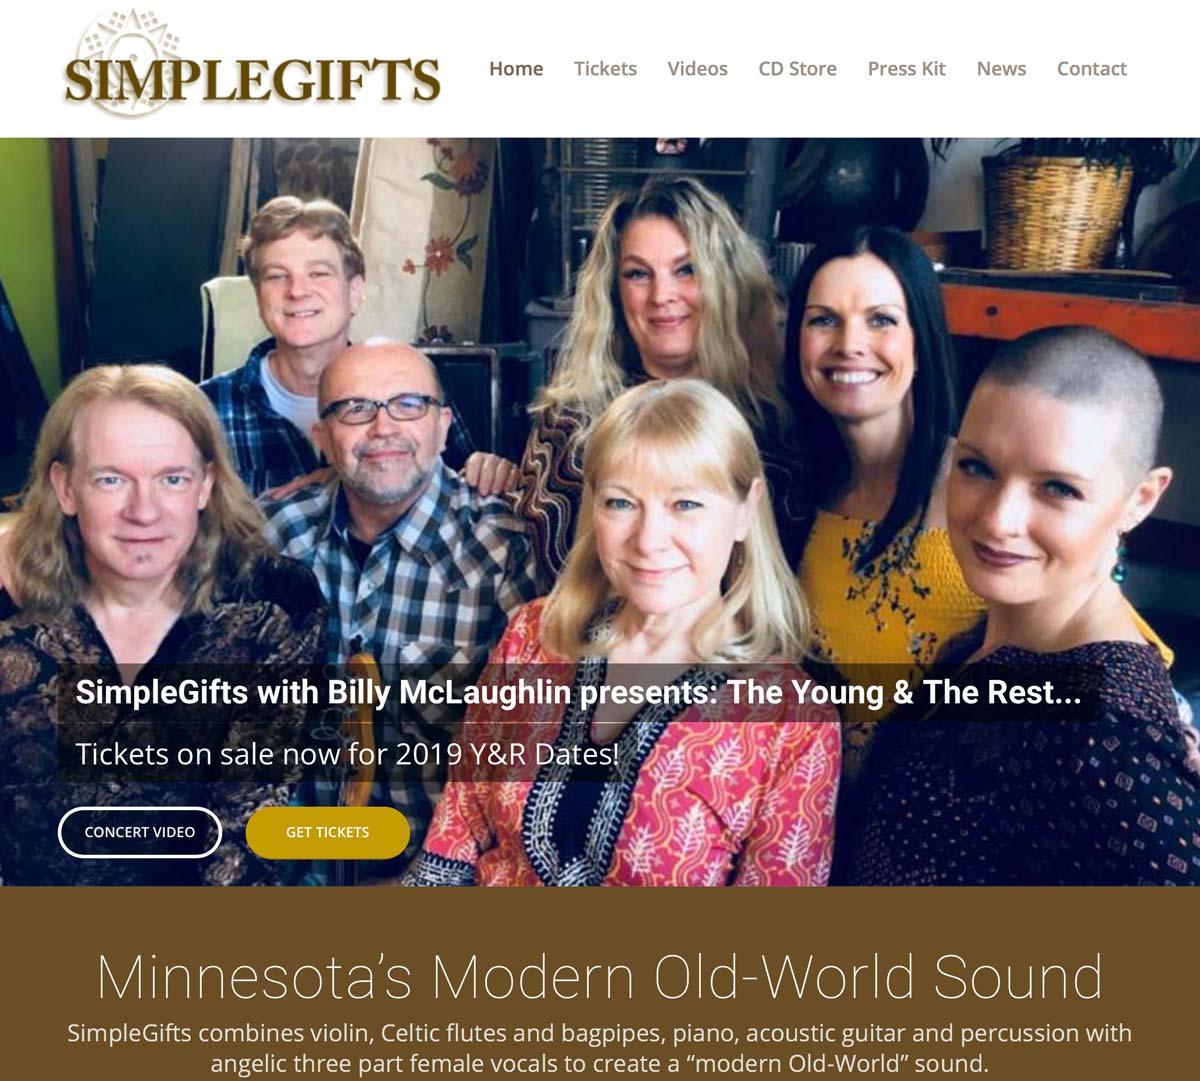 WordPress Website Design for SimpleGifts Billy McLaughlin